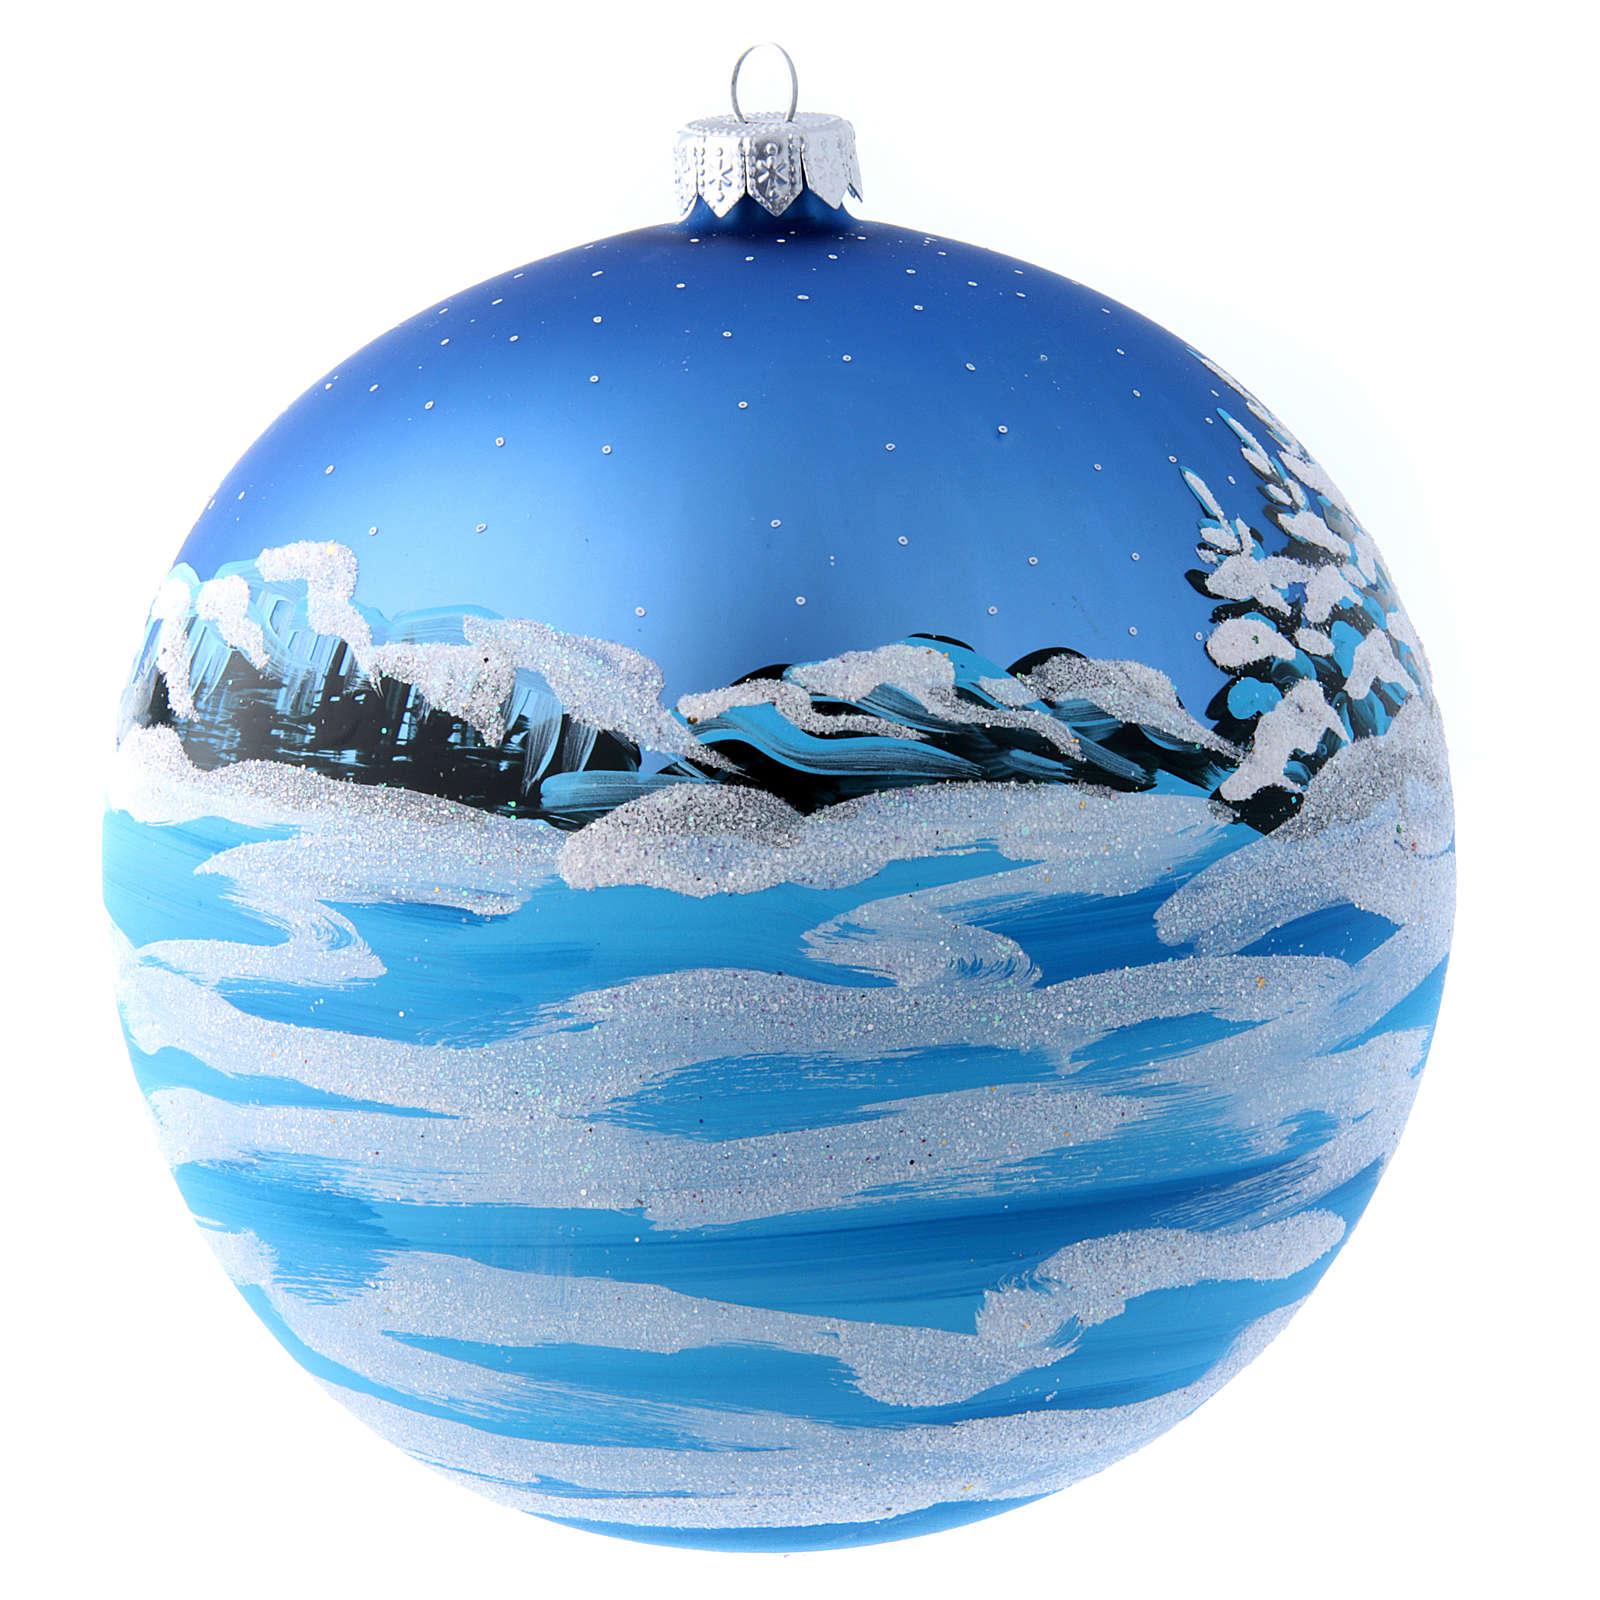 Pallina blu vetro 150 mm Babbo Natale con bimbo 4